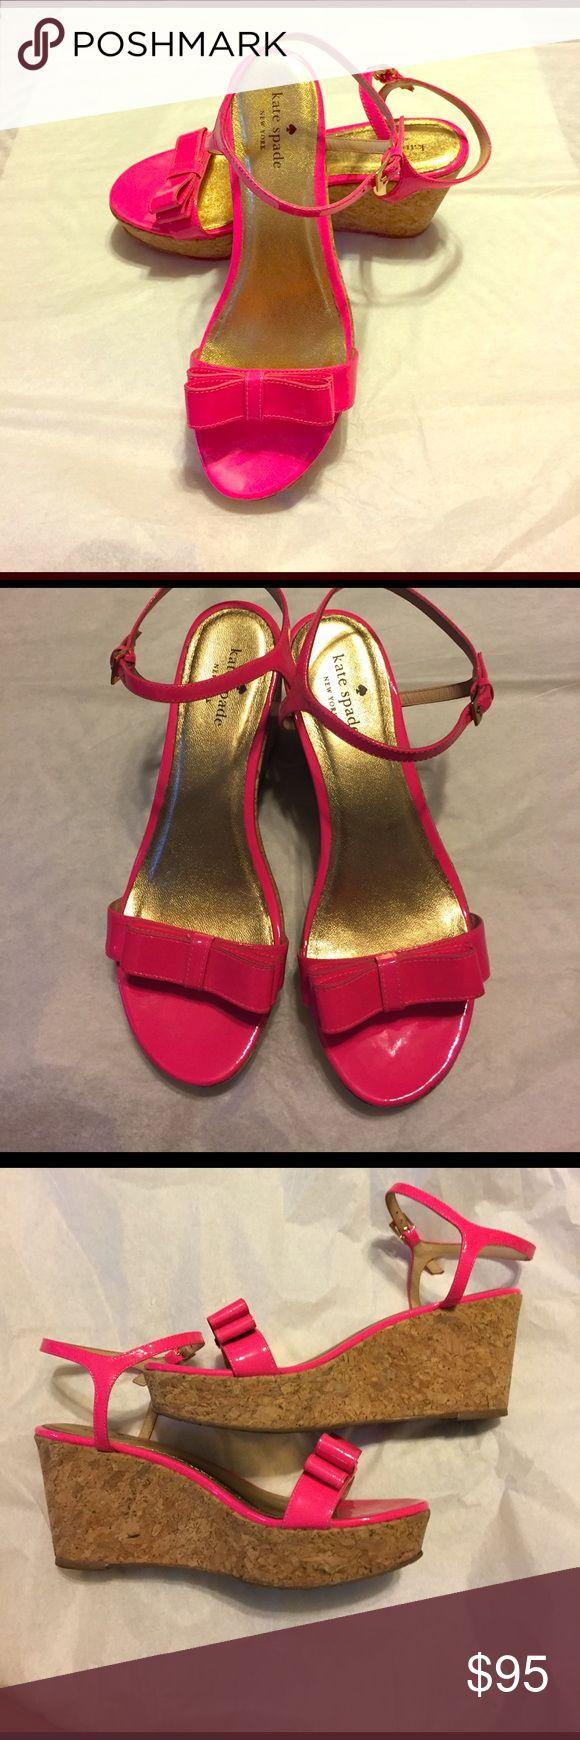 "Kate Spade Pink Wedge Heels Gently worn. Good condition! 3"" Heel. Open to reasonable offers kate spade Shoes Wedges"